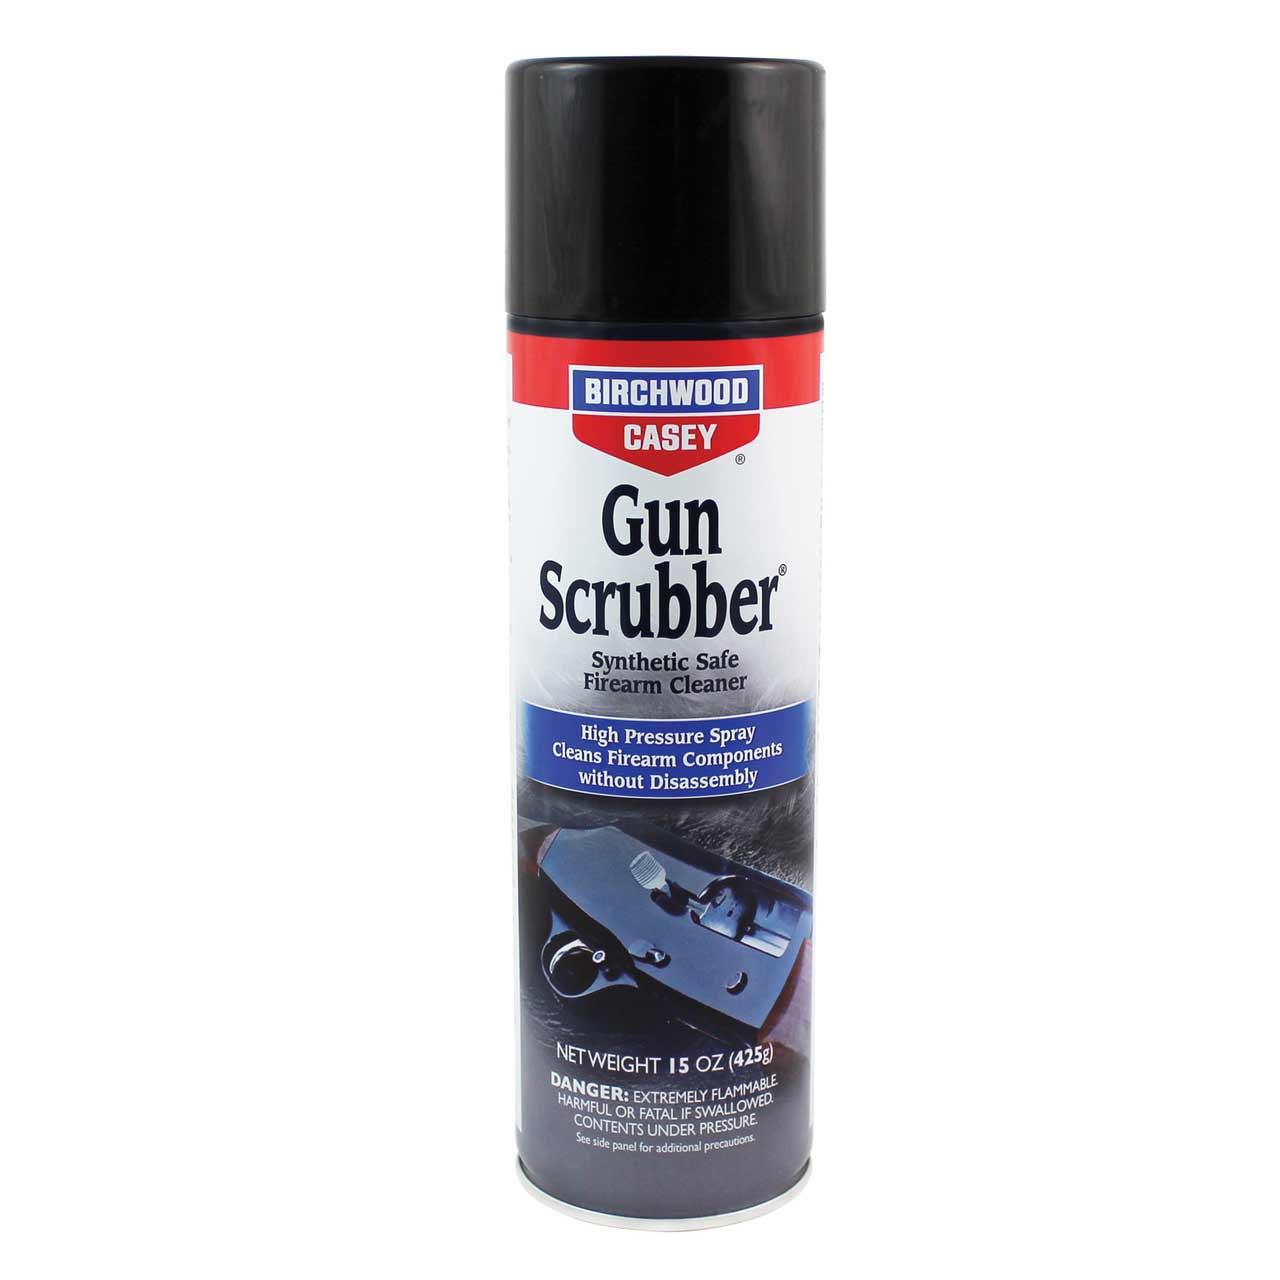 Birchwood Casey Gun Scrubber Synthetic Safe Cleaner